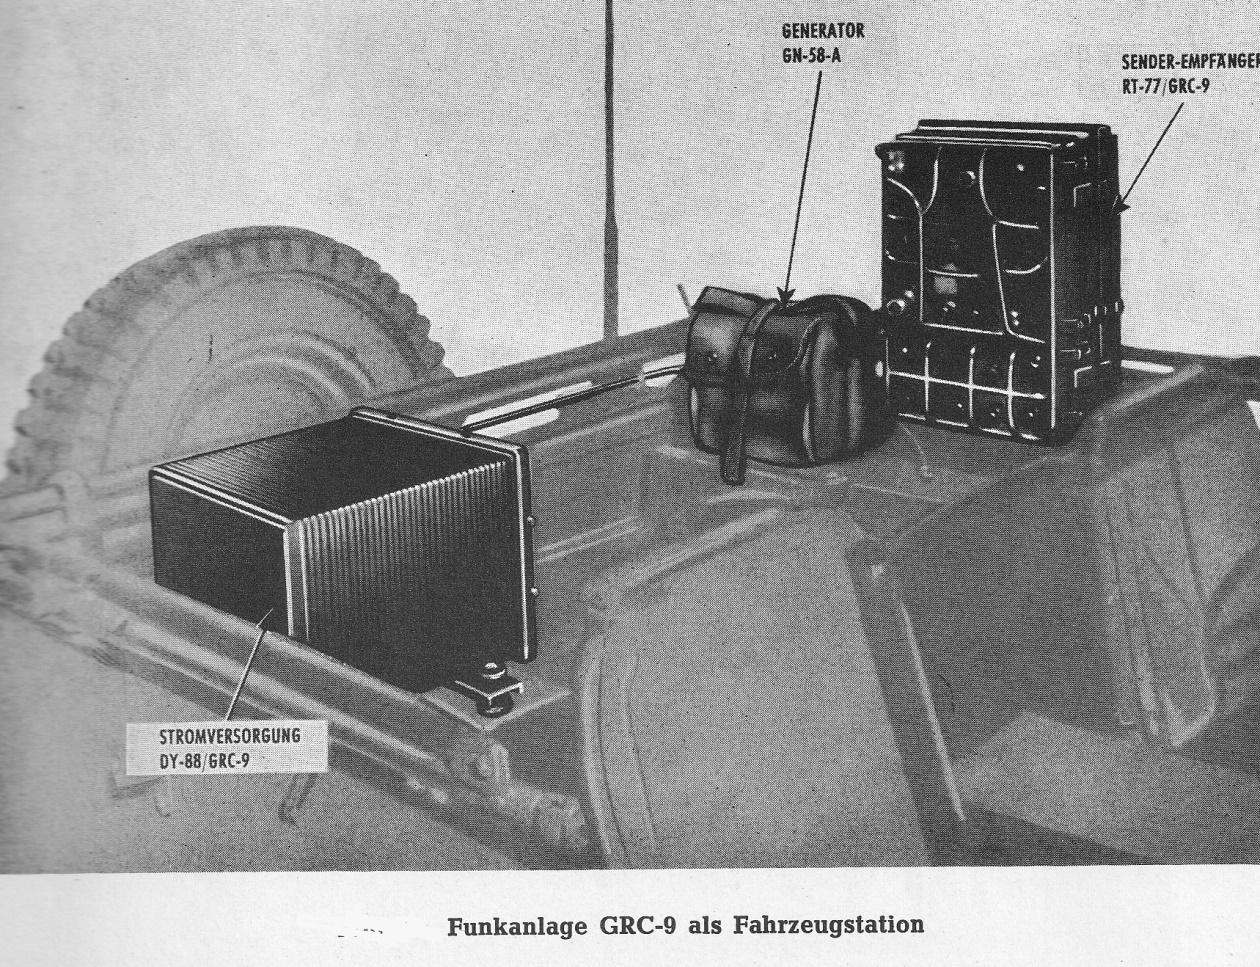 D:\Archiv Nemeth\Fzg-Gerät-Ausrüstung\Gerät\Nachrichtengerät\BH-US\AN GRC-9\Montage im Jeep.jpg